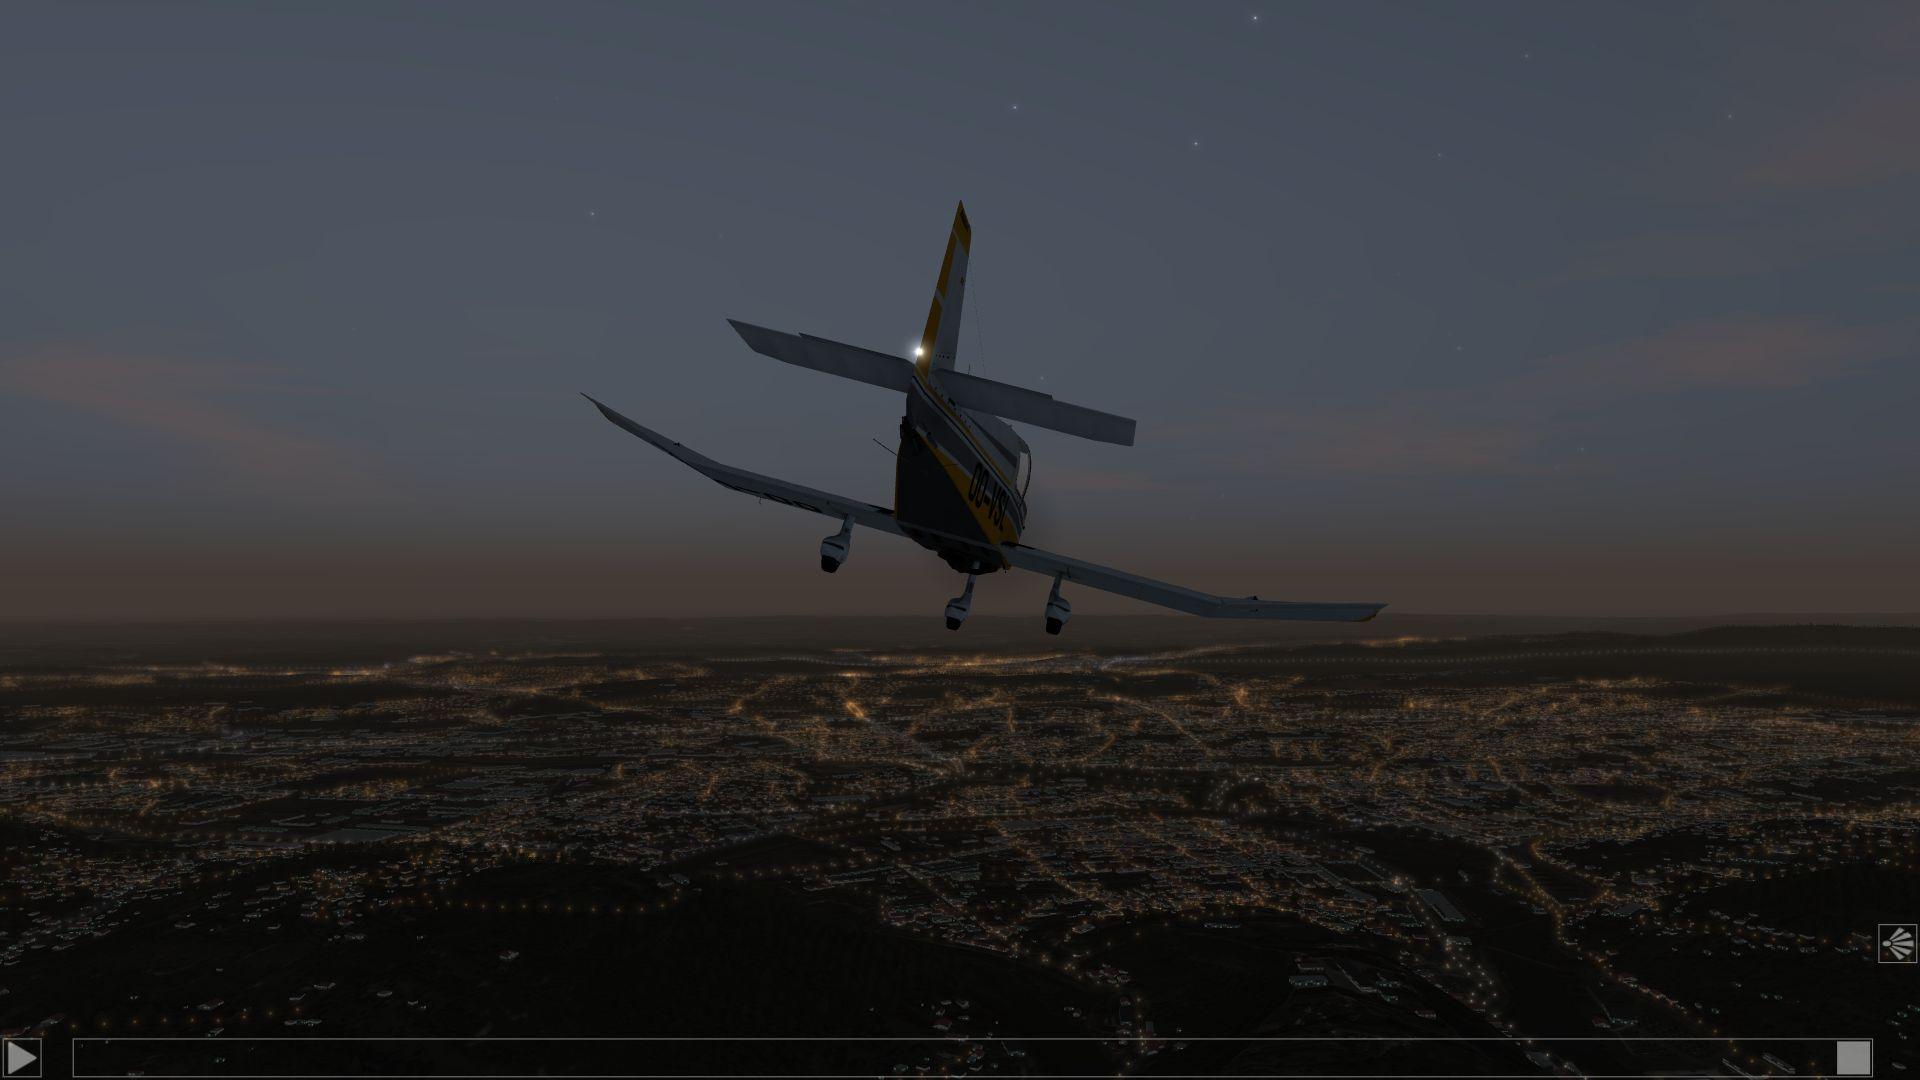 http://www.pilote-virtuel.com/img/gallery/1517173505.jpg